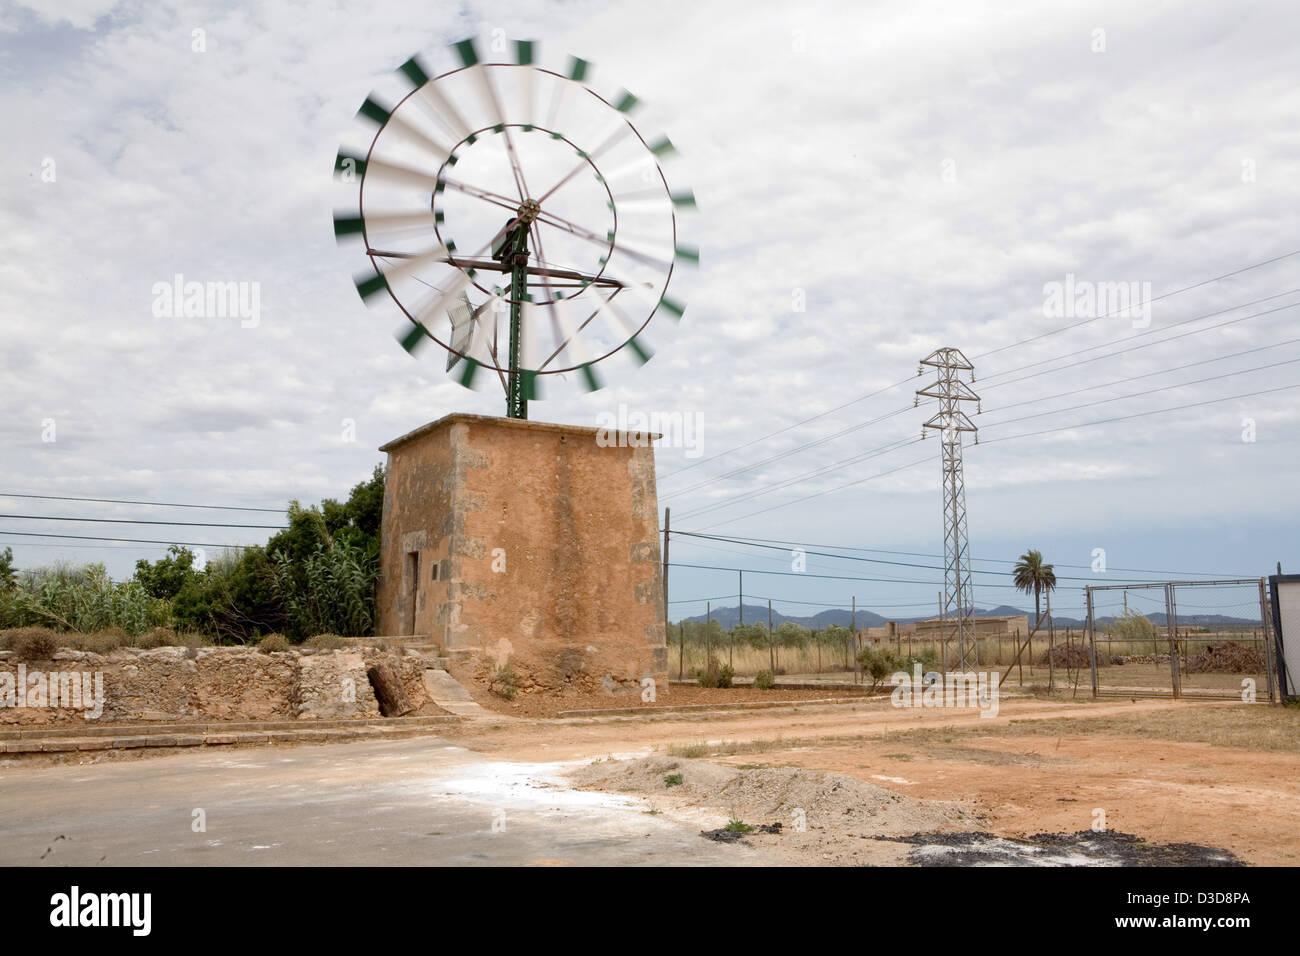 Campos, Mallorca, Spain, a typical Mallorcan Windmill - Stock Image